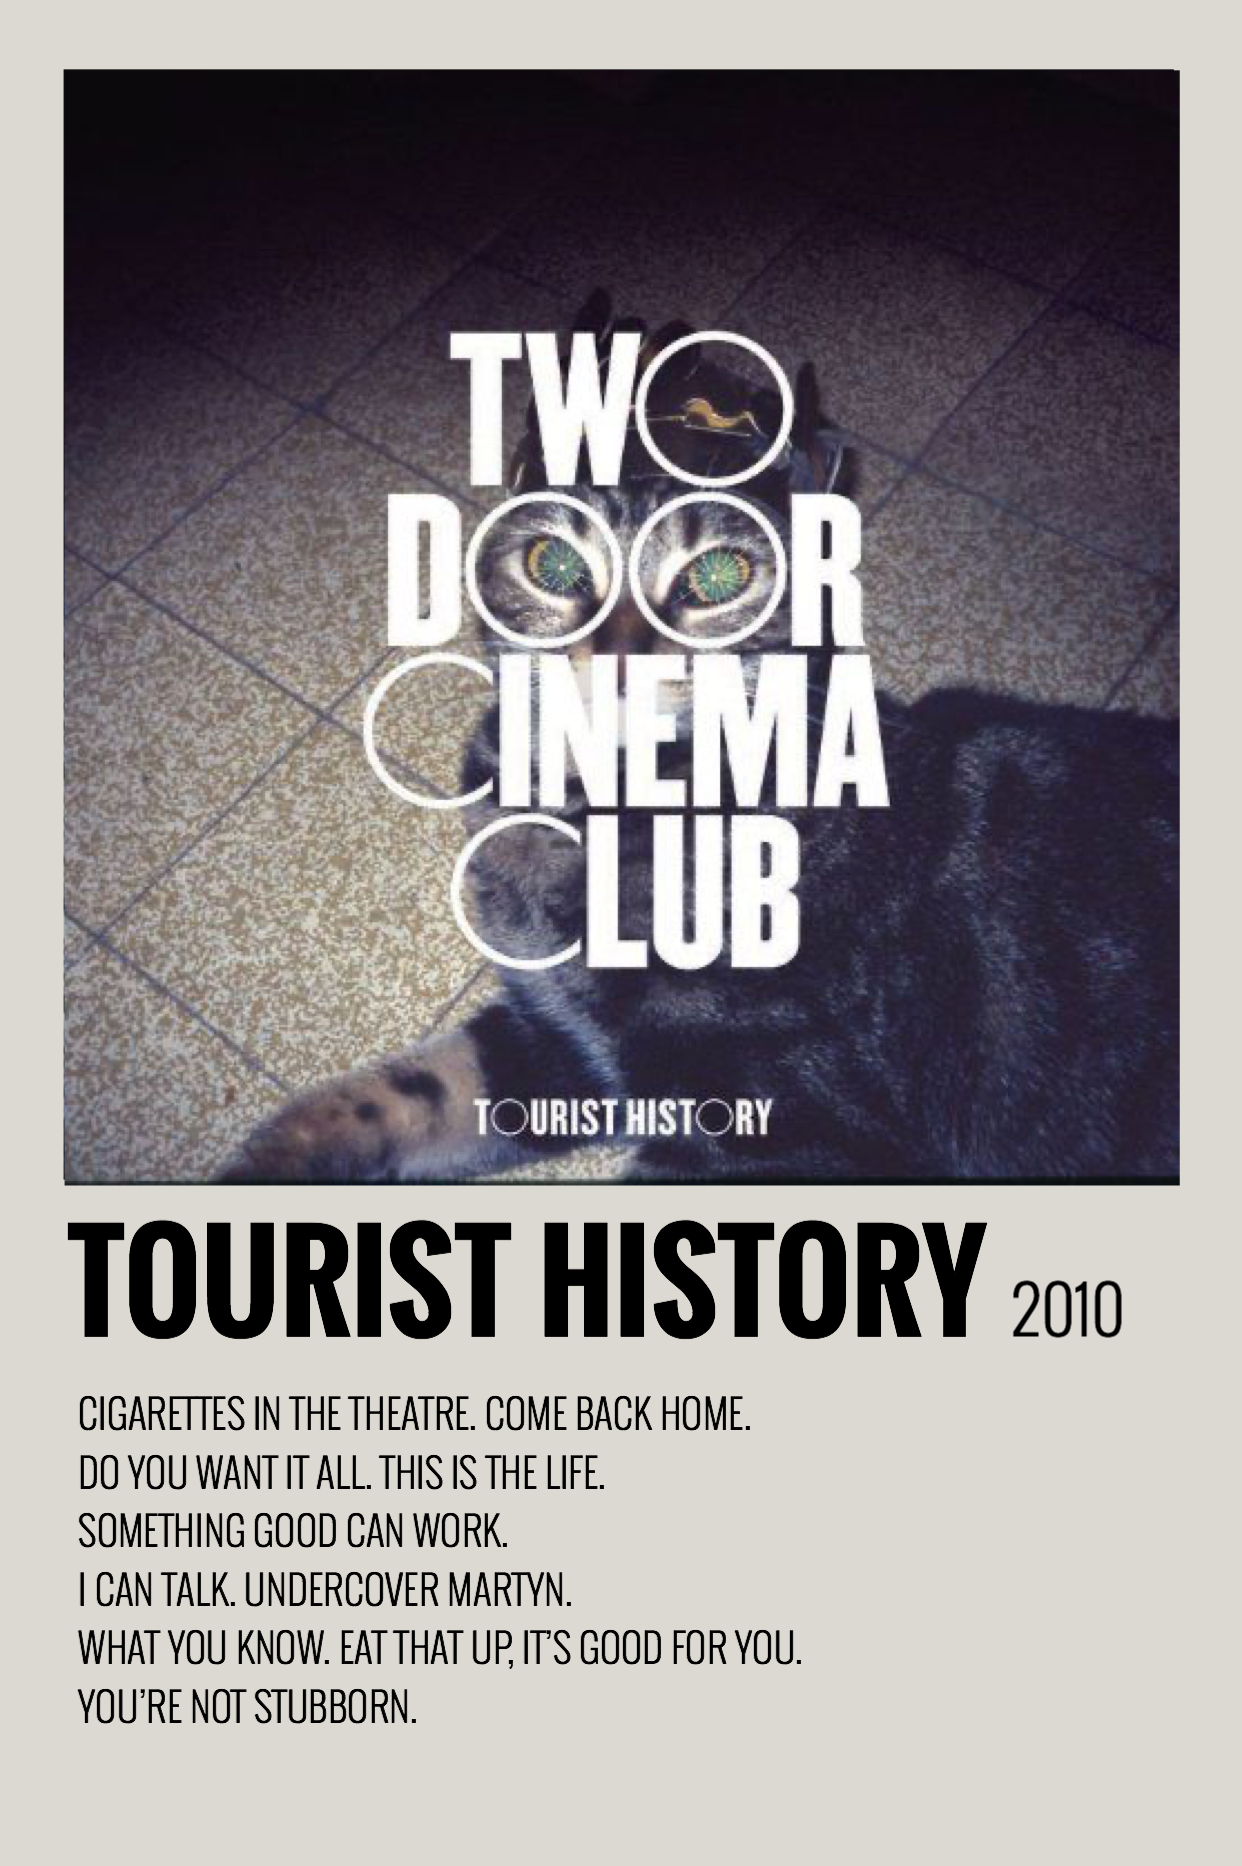 Minimalist Polaroid Album Poster Two Door Cinema Club Tourist History In 2020 Music Poster Design Music Poster Music Album Covers